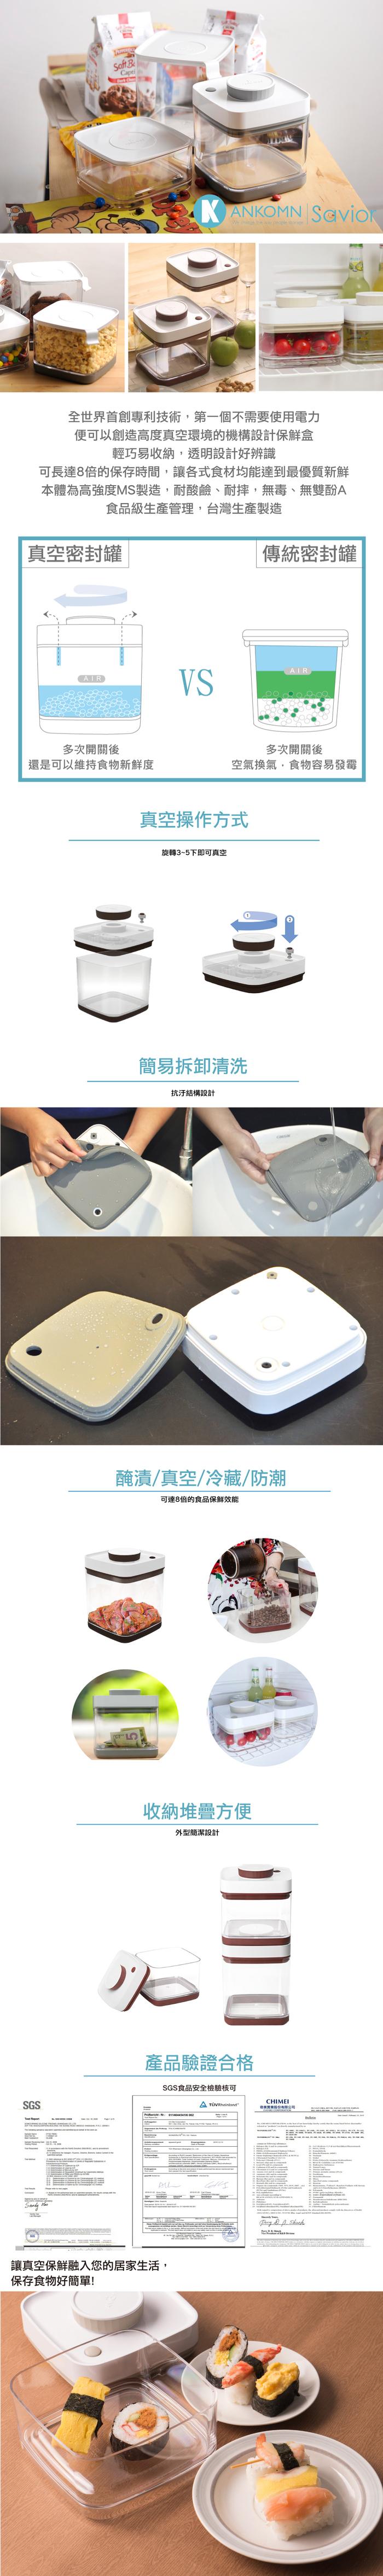 ANKOMN|Savior 真空保鮮盒1.5公升(灰色)